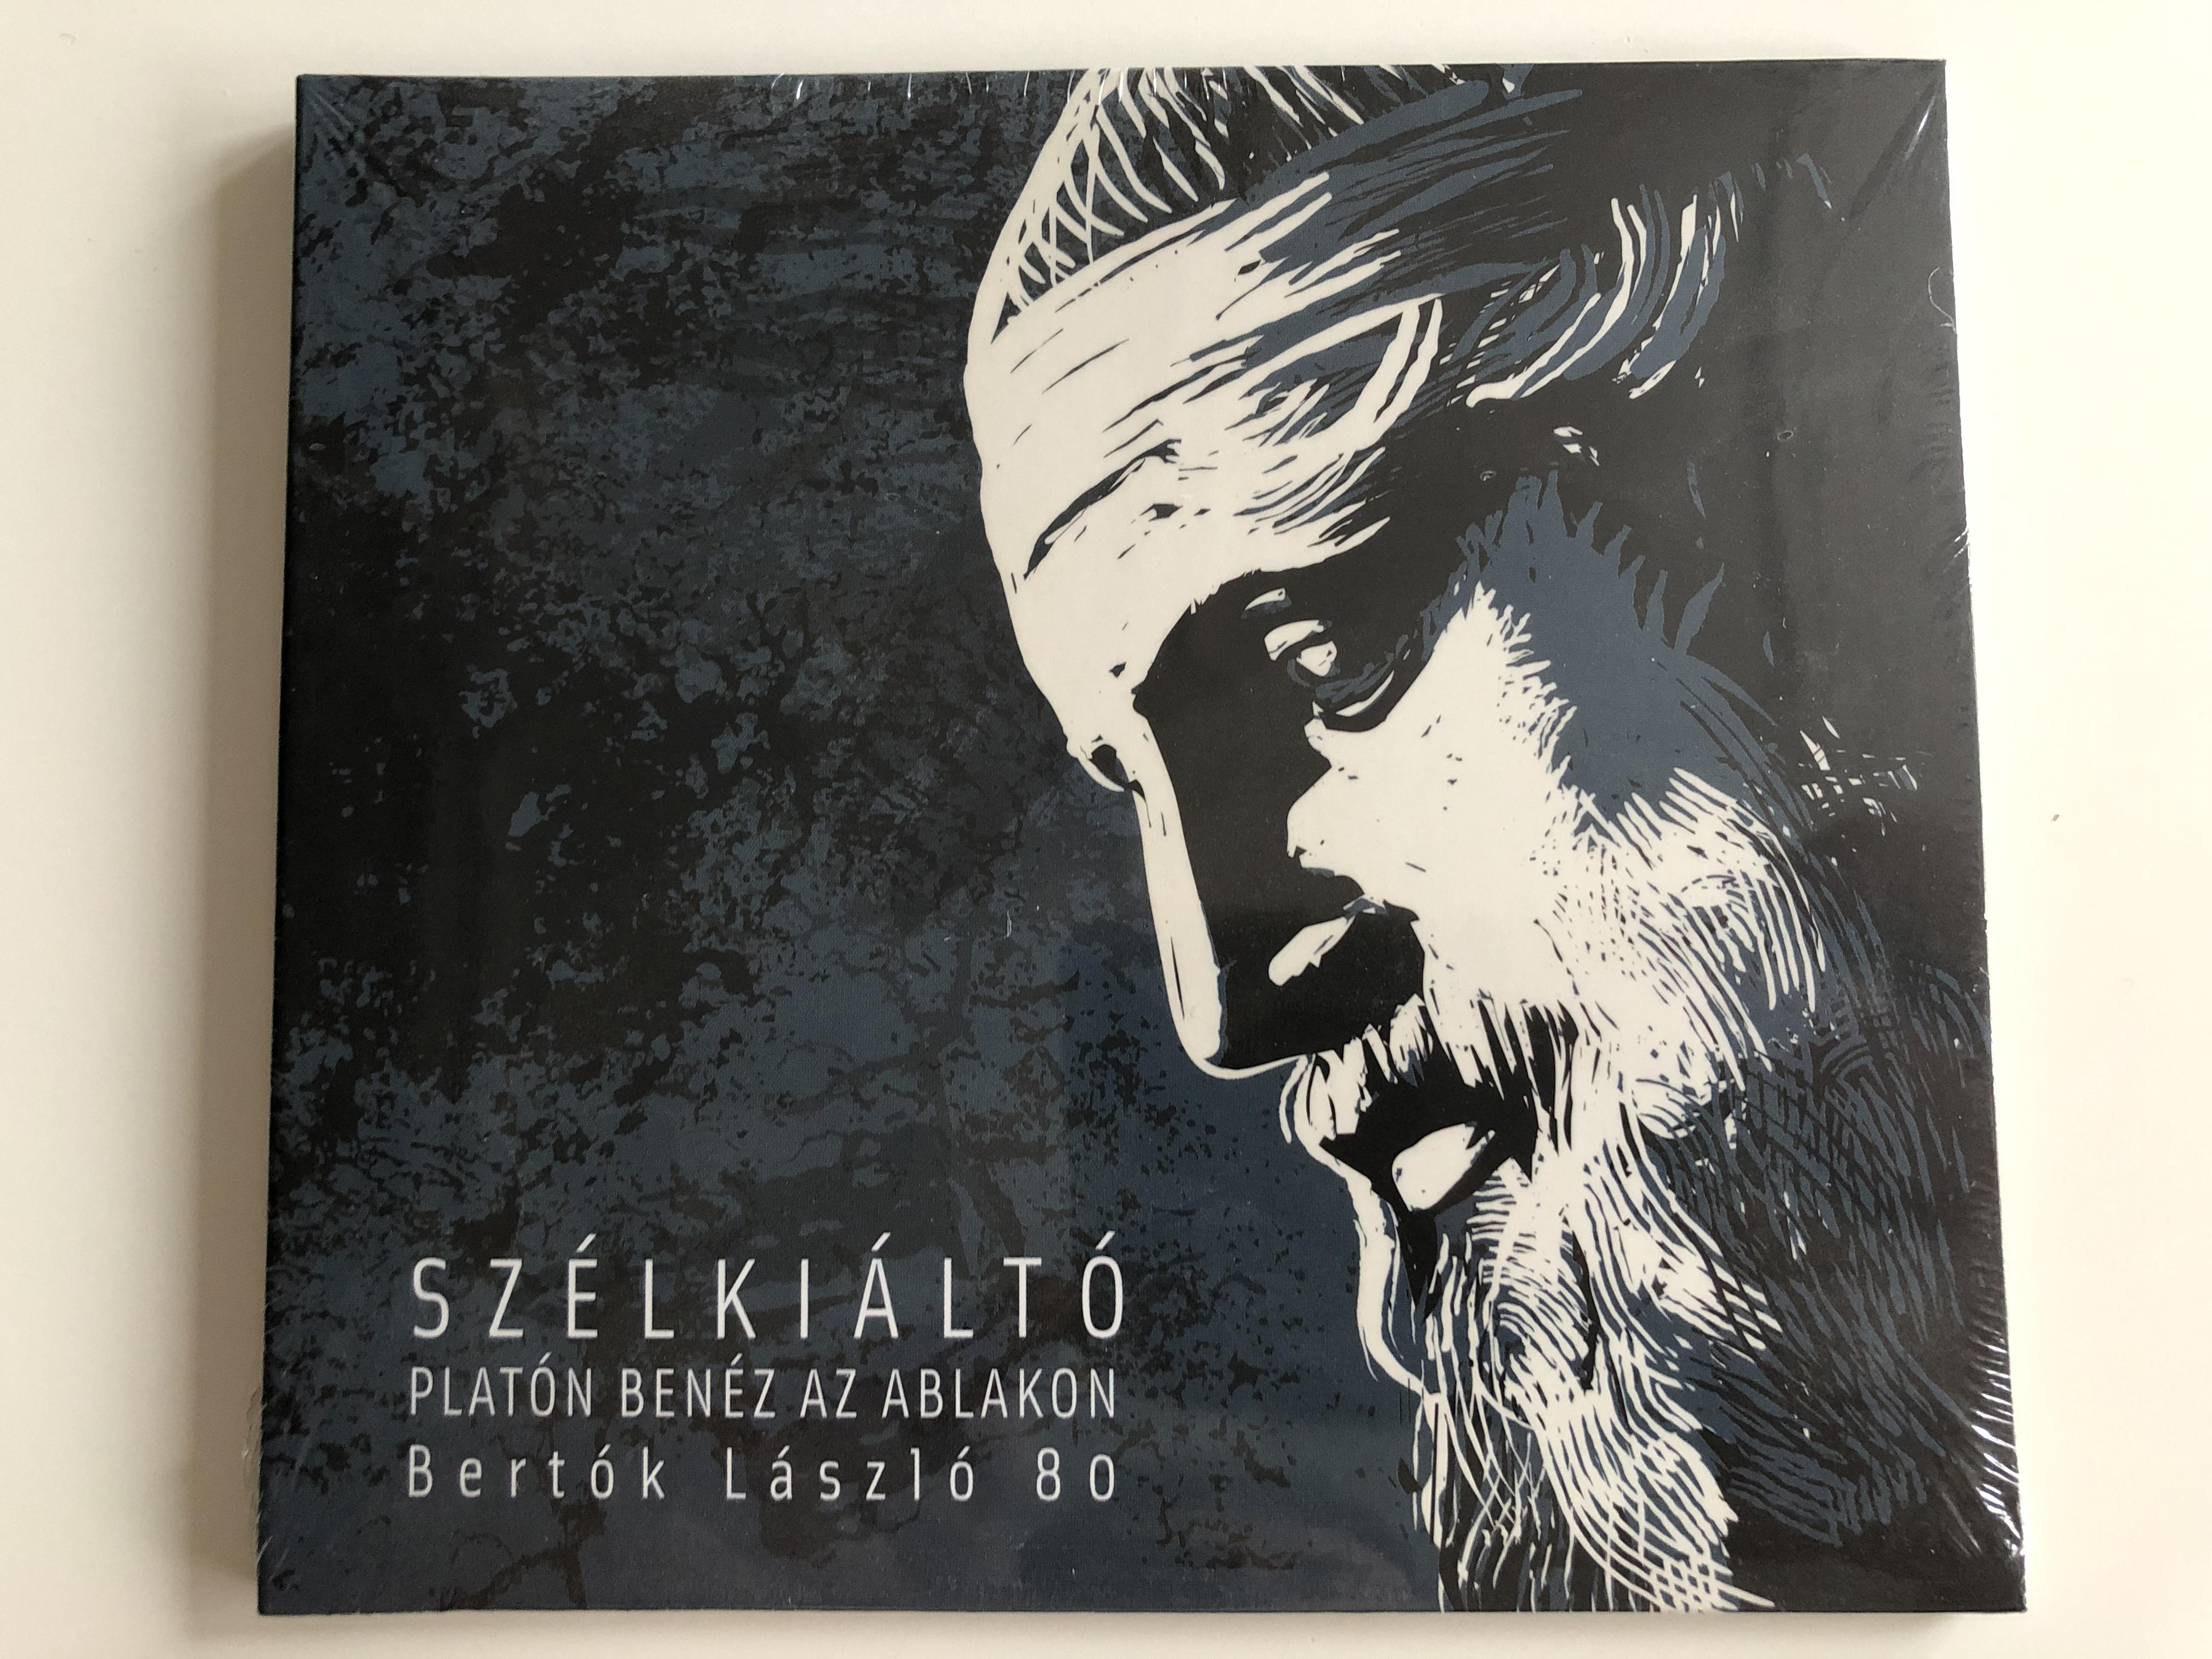 szelkialto-platon-benez-az-ablakon-bertok-laszlo-80-gryllus-audio-cd-2017-gcd-194-2017-1-.jpg